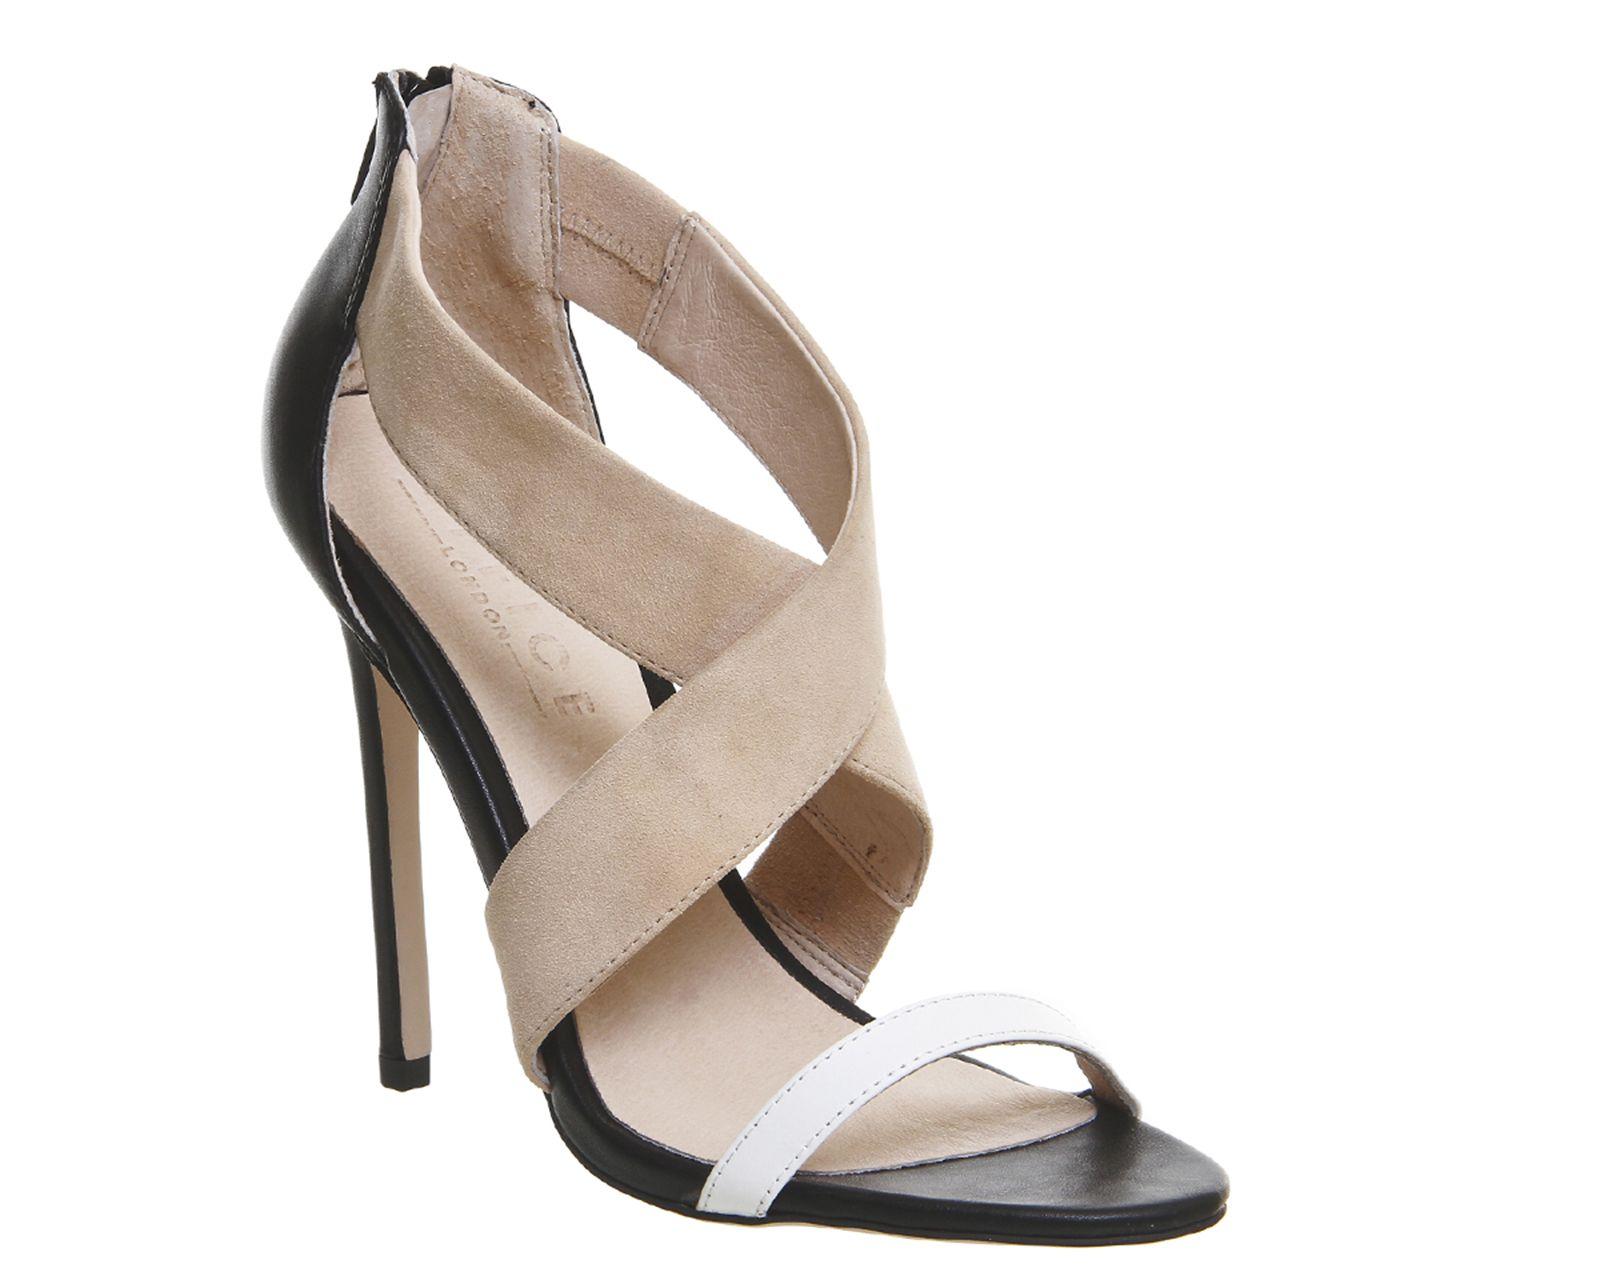 617ee80a1232 Buy Multi Leather Office Allure Cross Strap Heels from OFFICE.co.uk ...